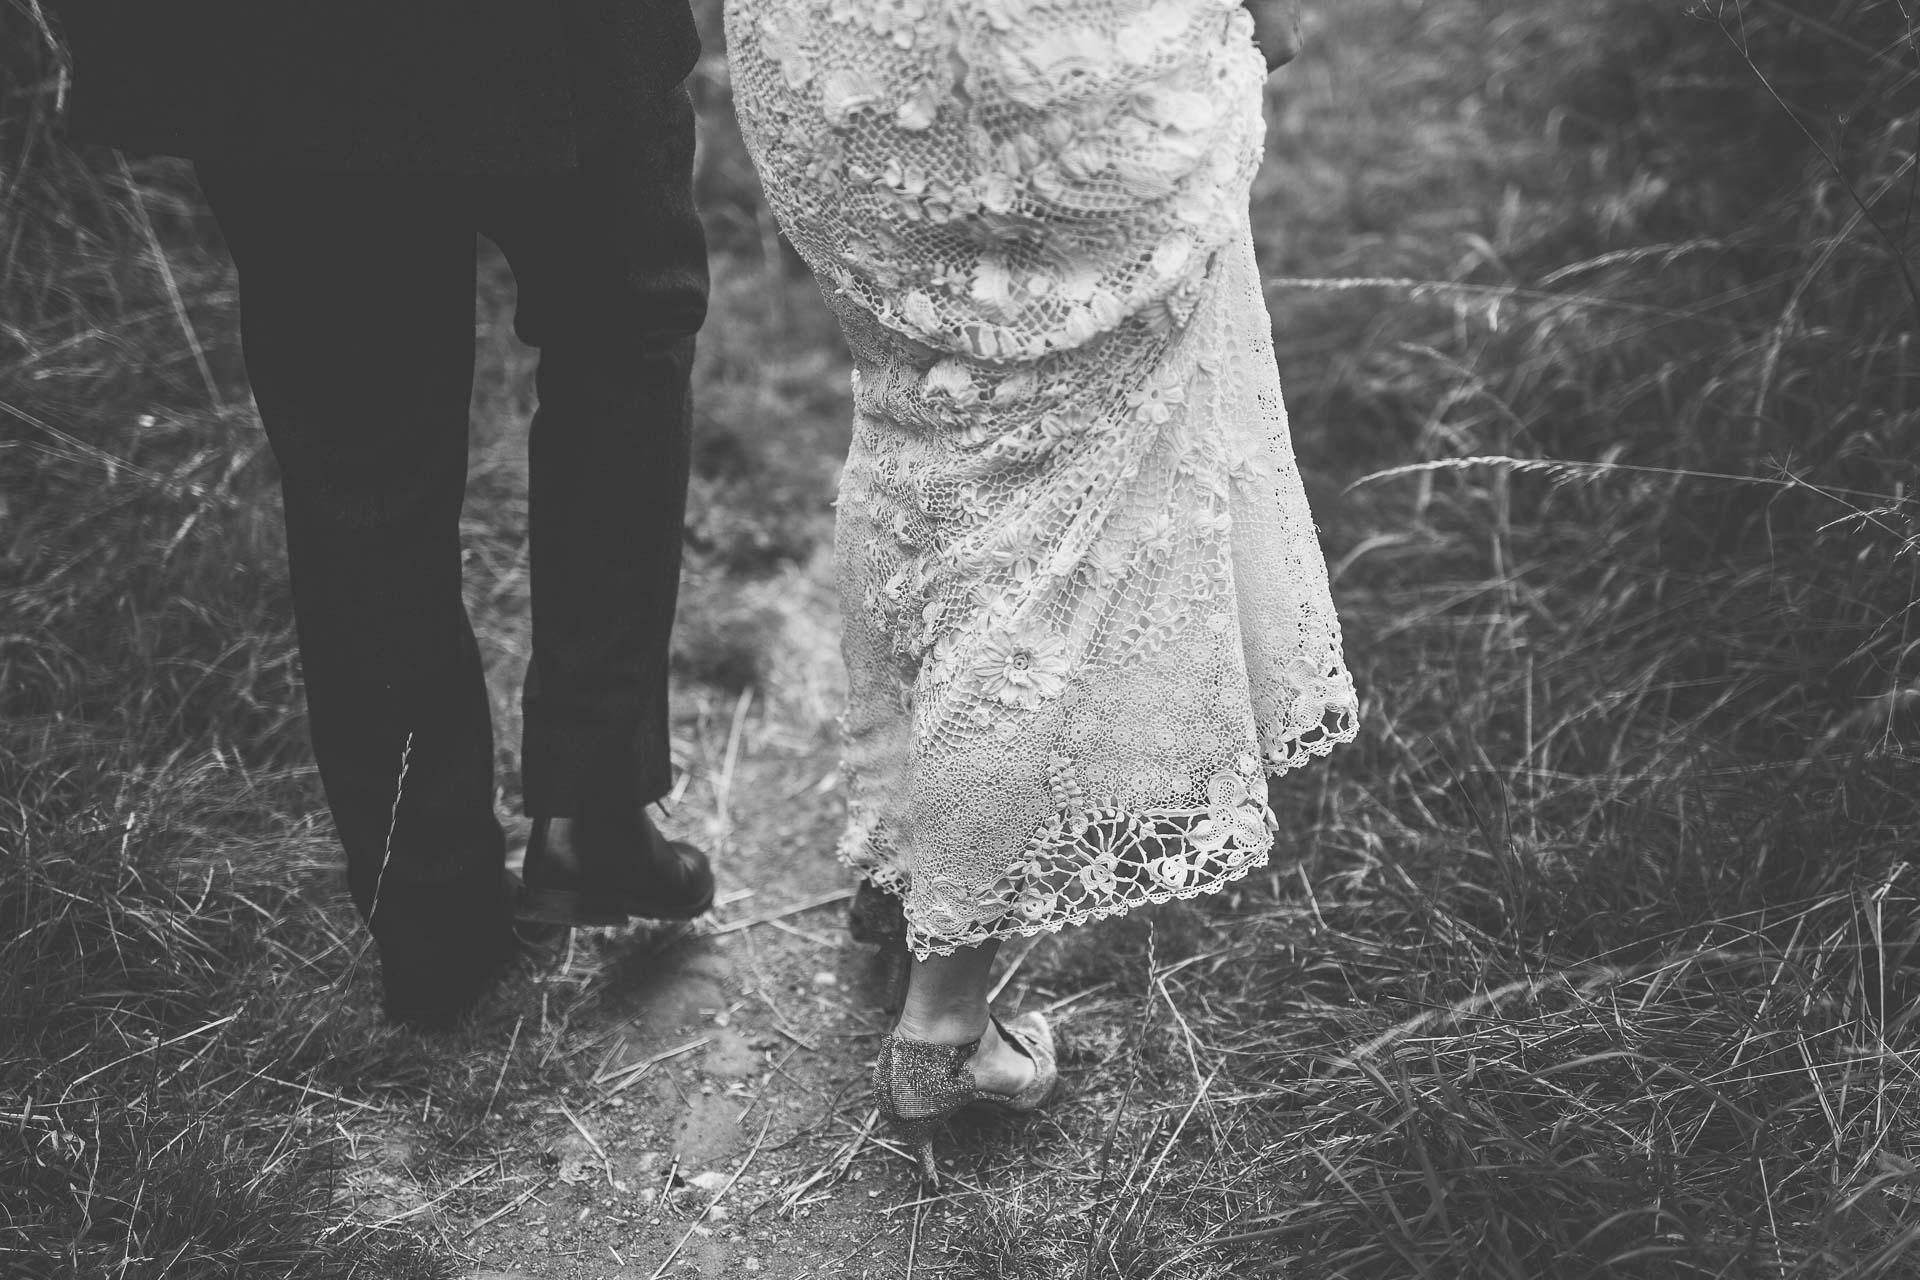 winterbourne-medieval-barn-wedding-photography-emma-andrew-85